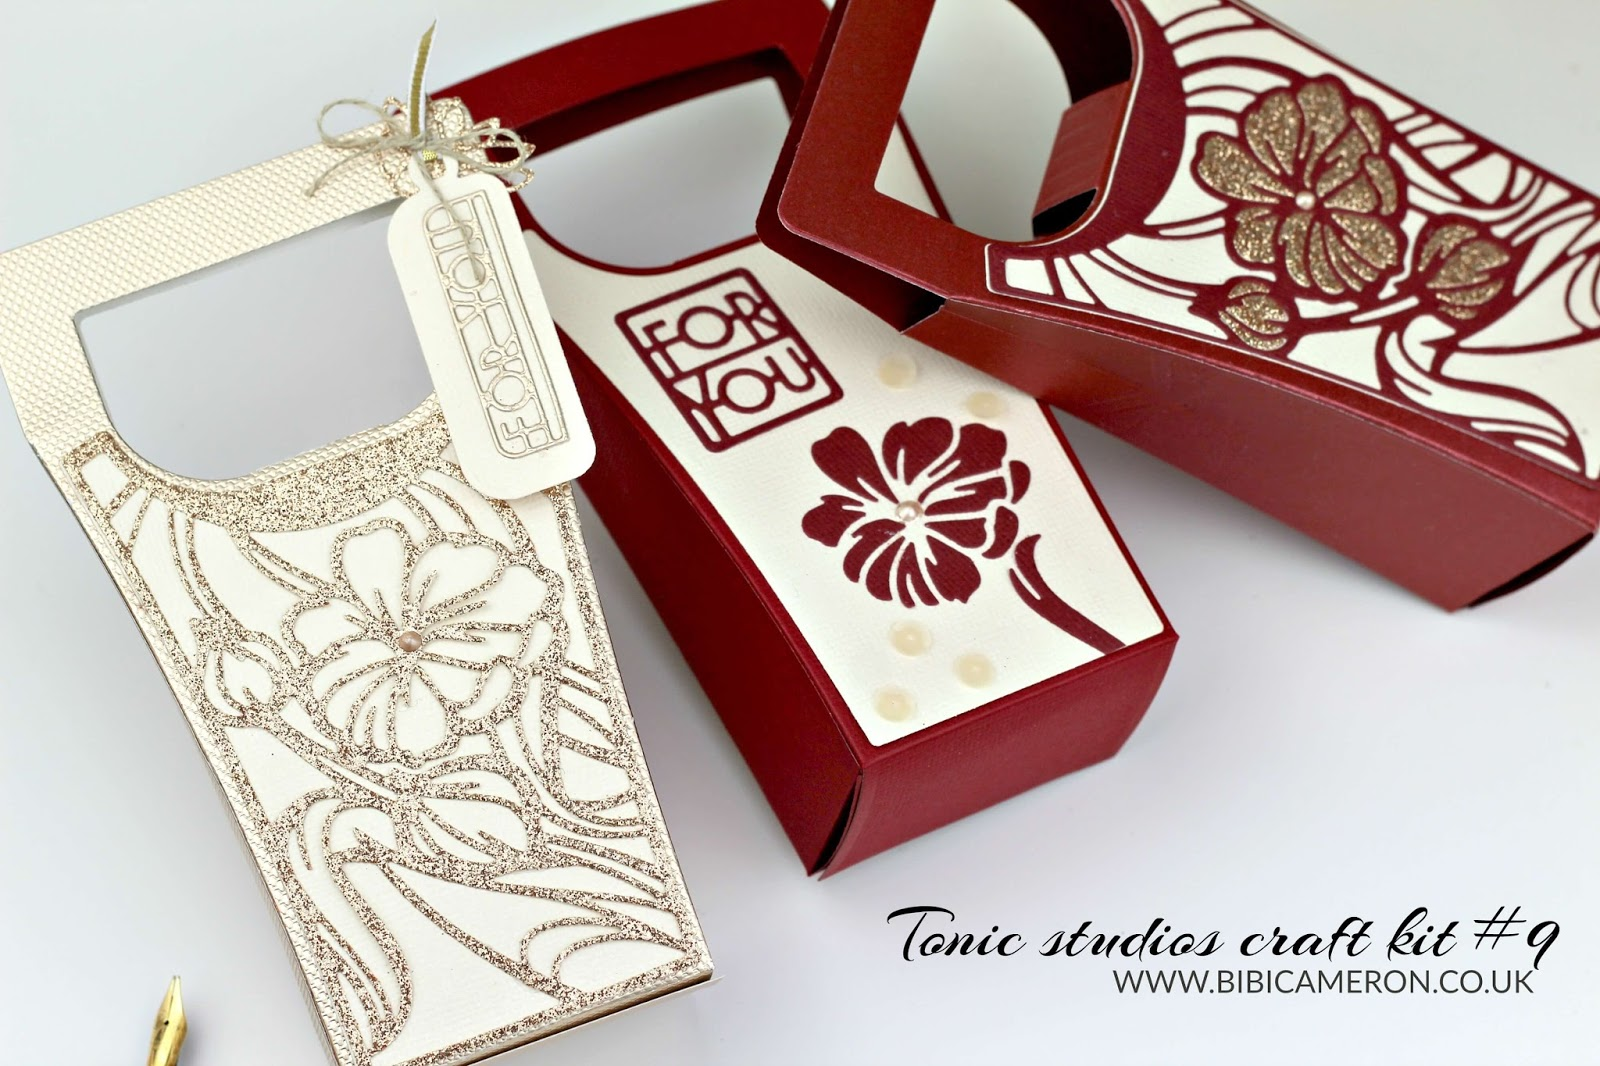 Tonic Studios Craft kit # 9 – DIY  fabric shim for paper piecing